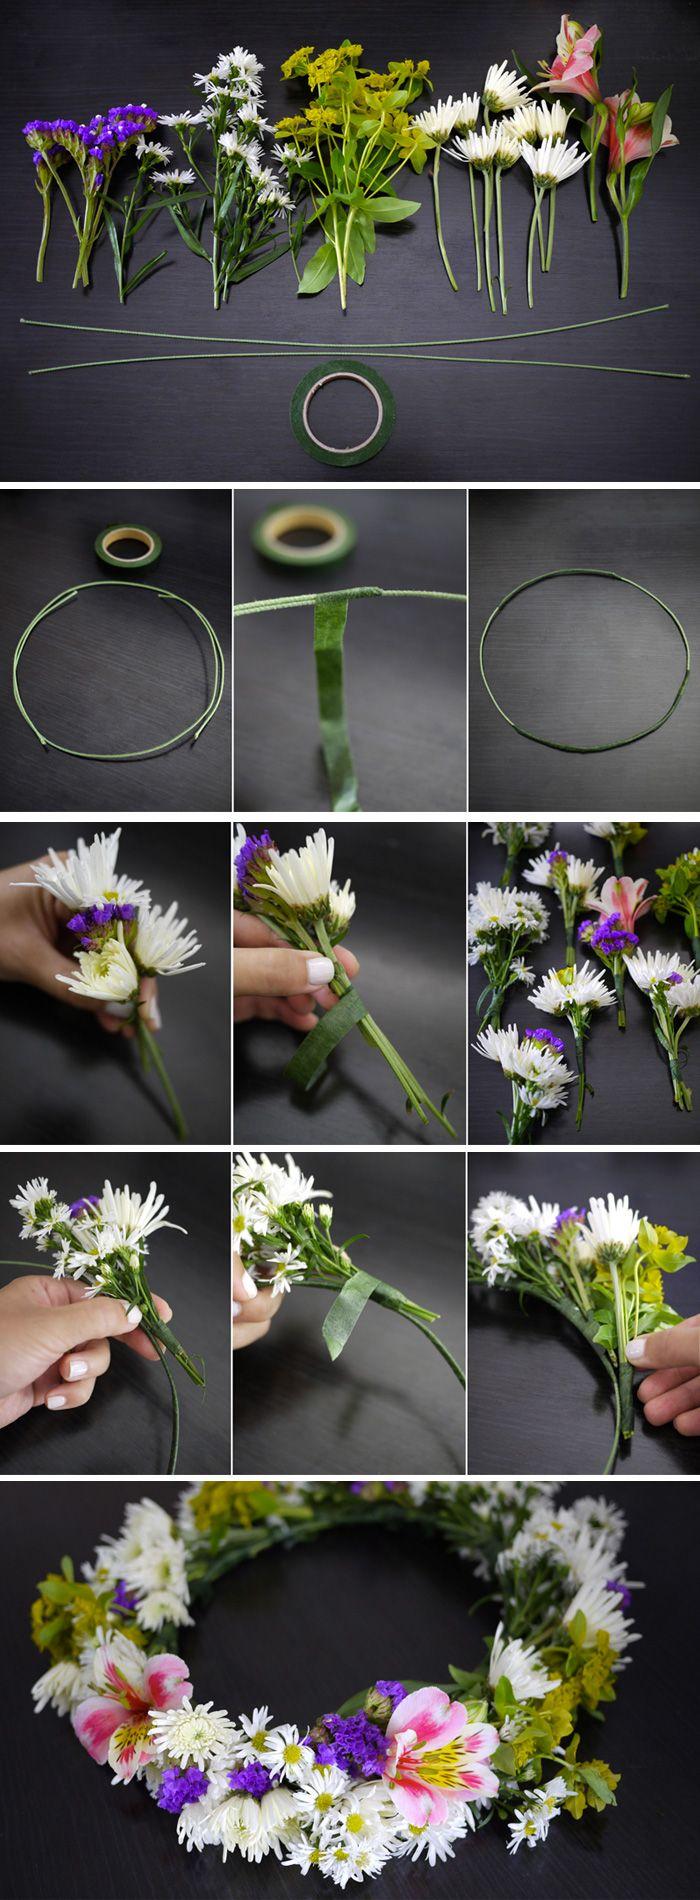 DIY Flower Wreath Step-by-Step Tutorial / Midsommarkrans steg för steg